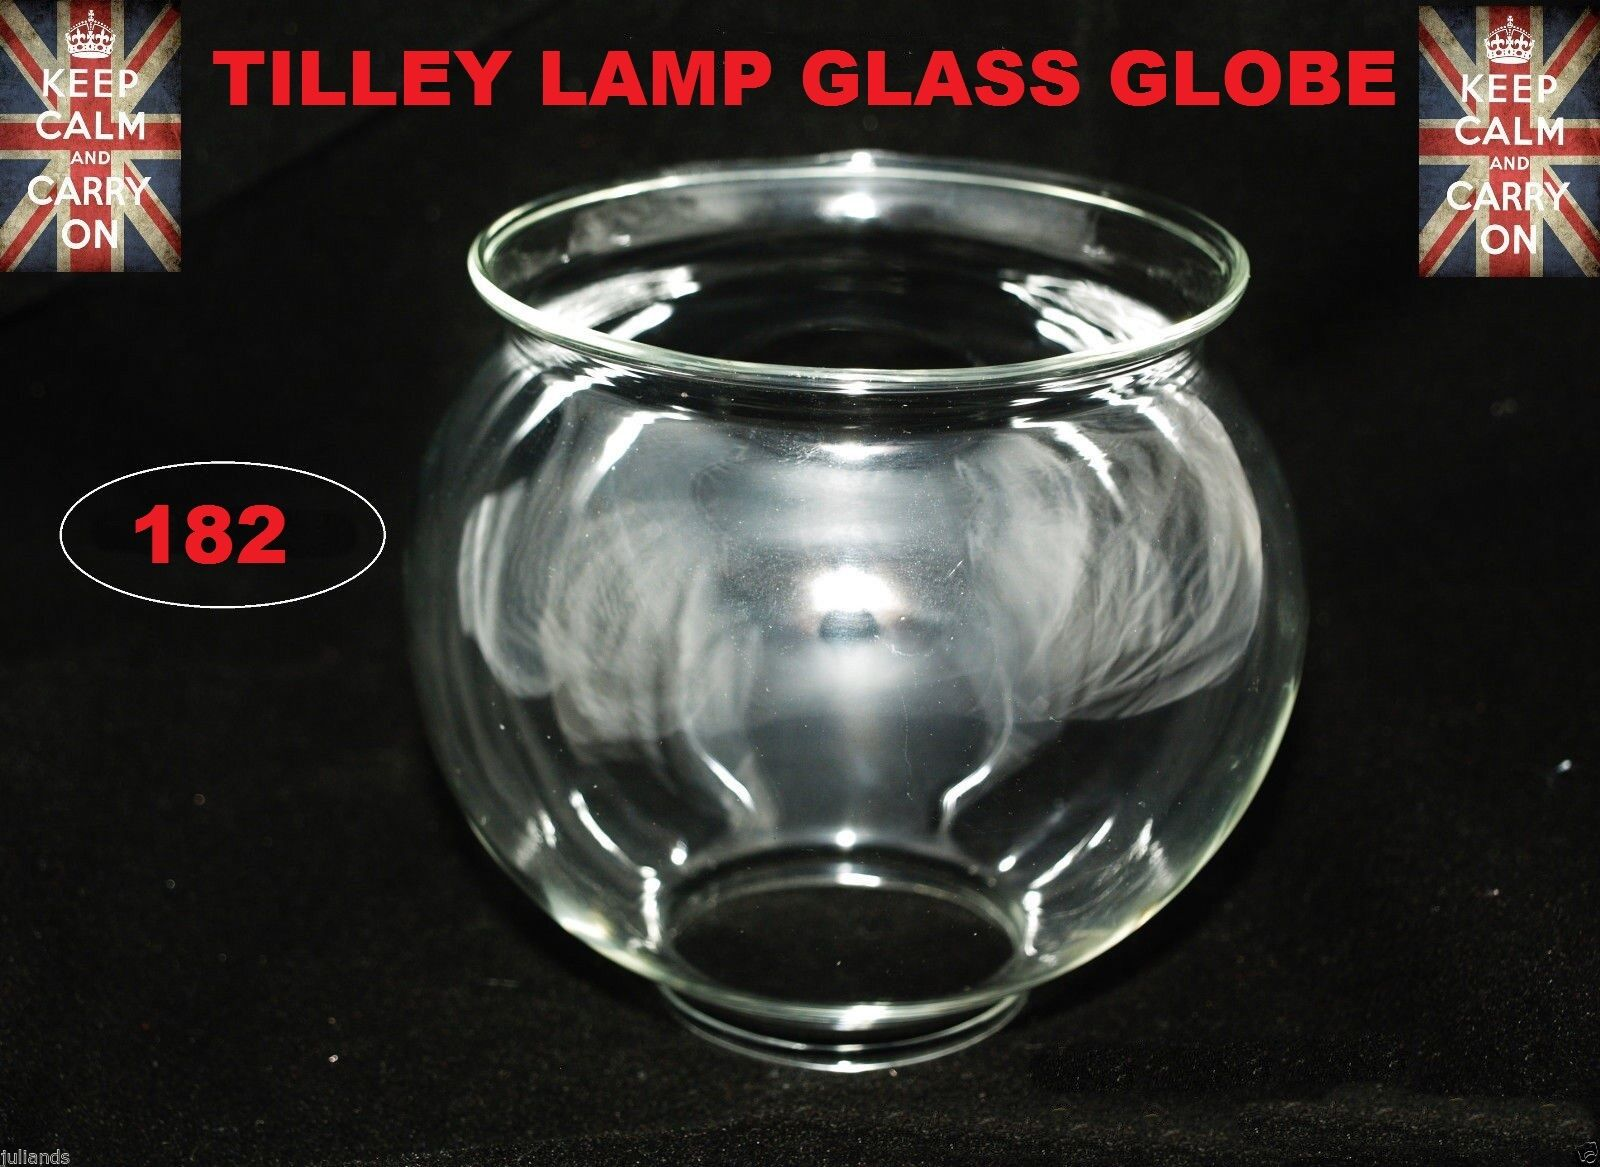 TILLEY RADIATOR WIRE MANTLE TILLEY LAMP SPARES